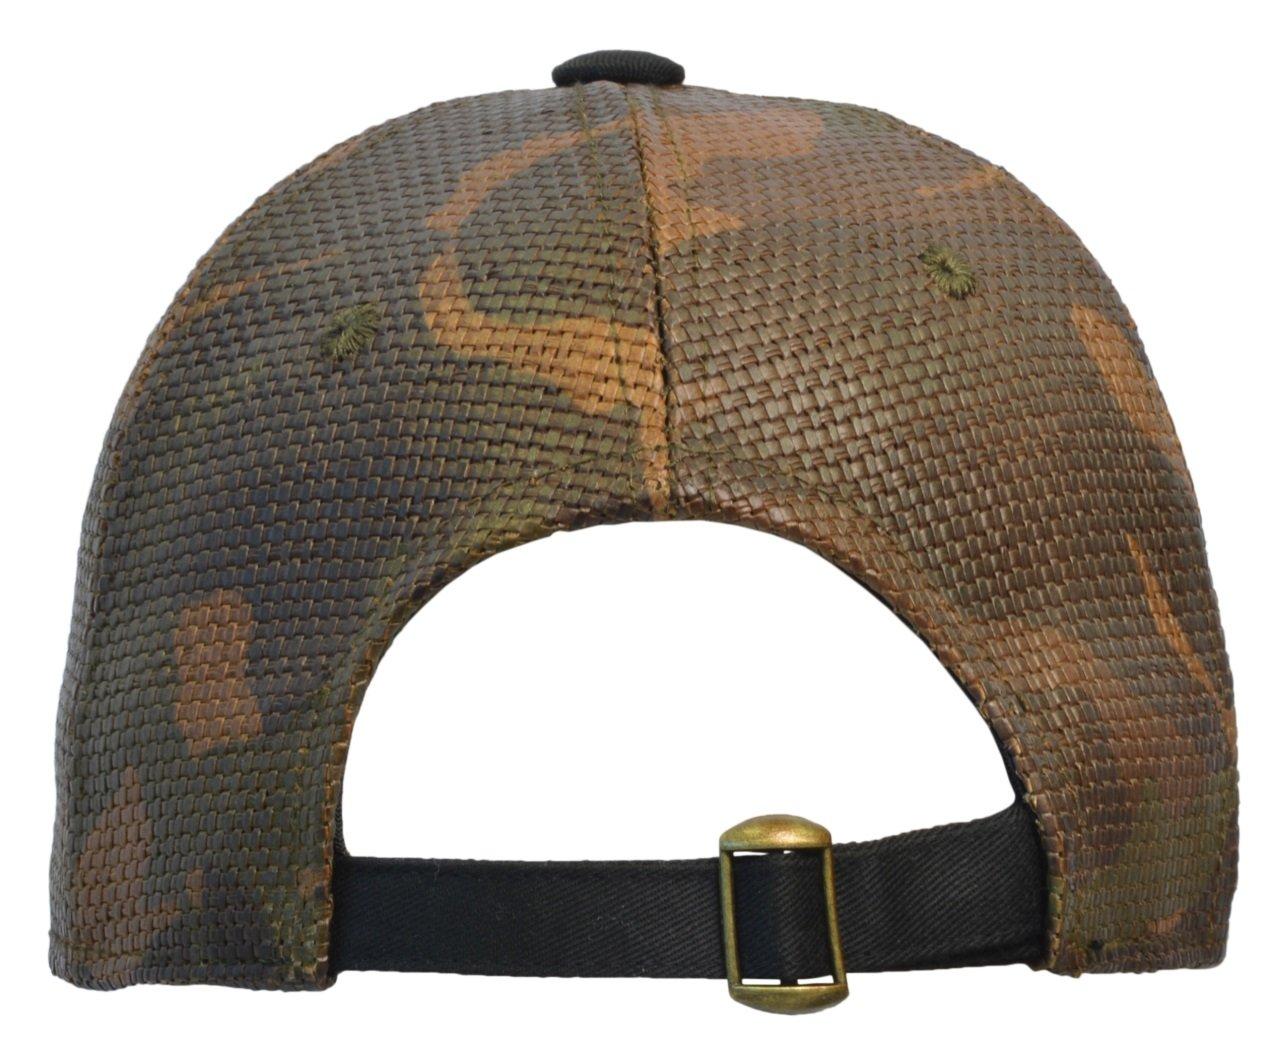 Terra Mens Flat Bill Hat Hip-Hop Snapback Cap Red Line Pattern Adjustable Buckle Closure